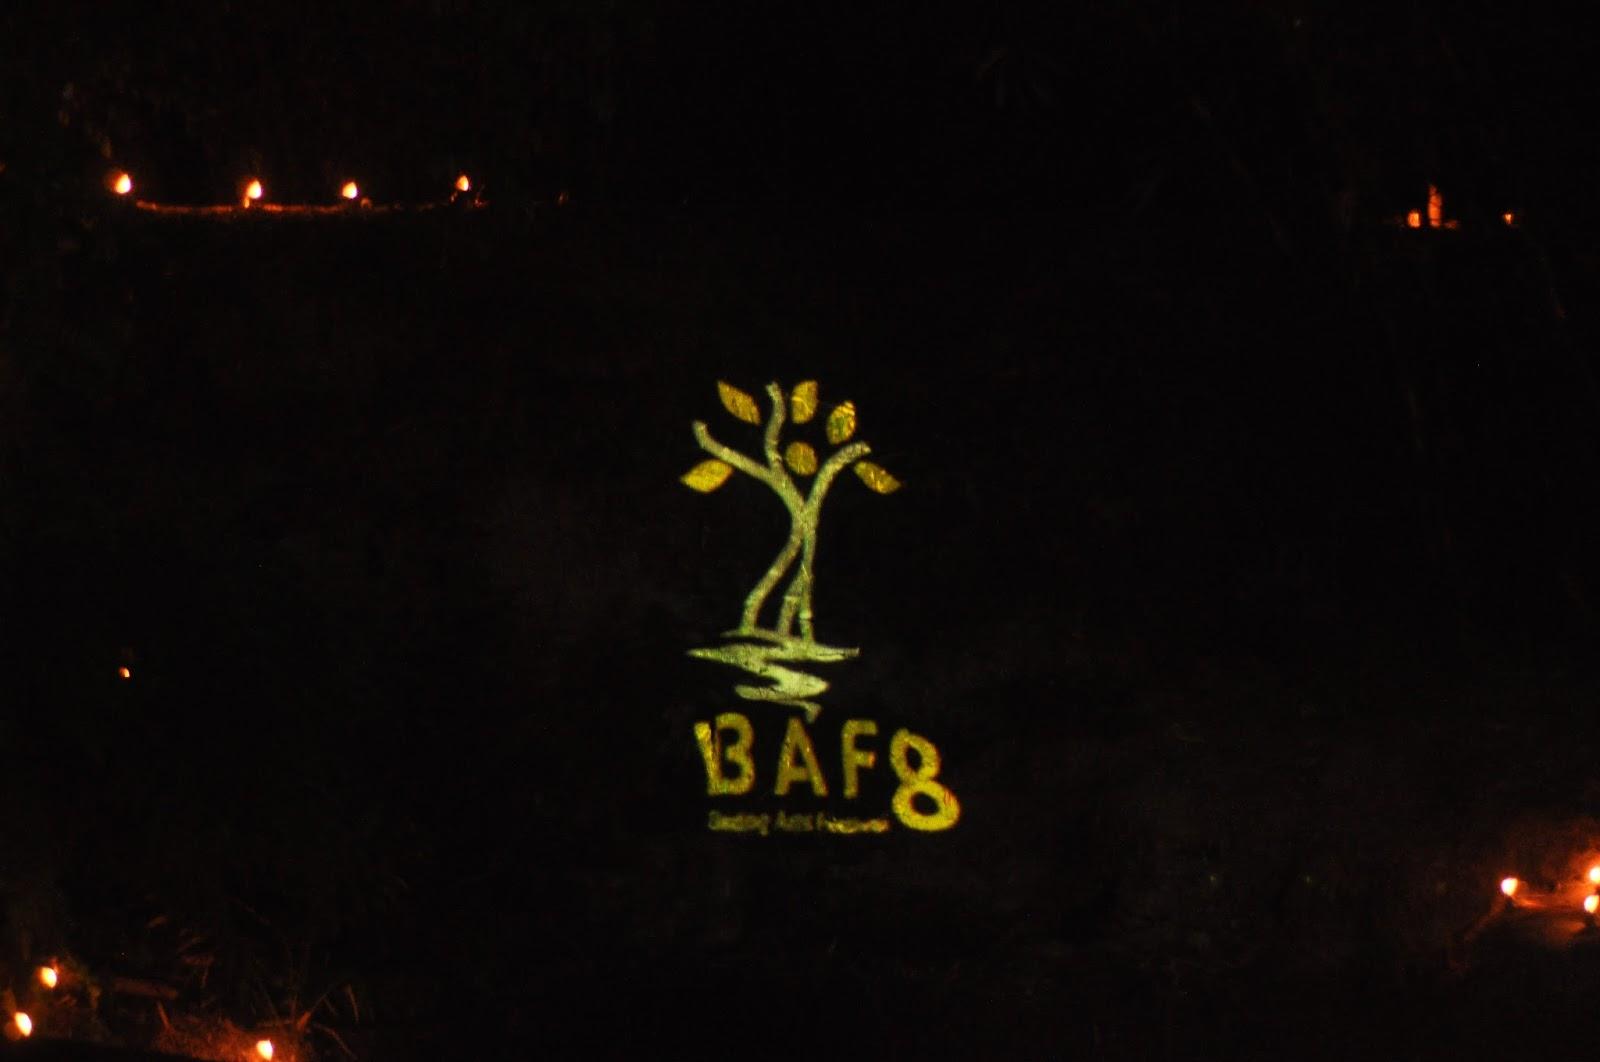 Dorong Motor dari Bedog Art Festival